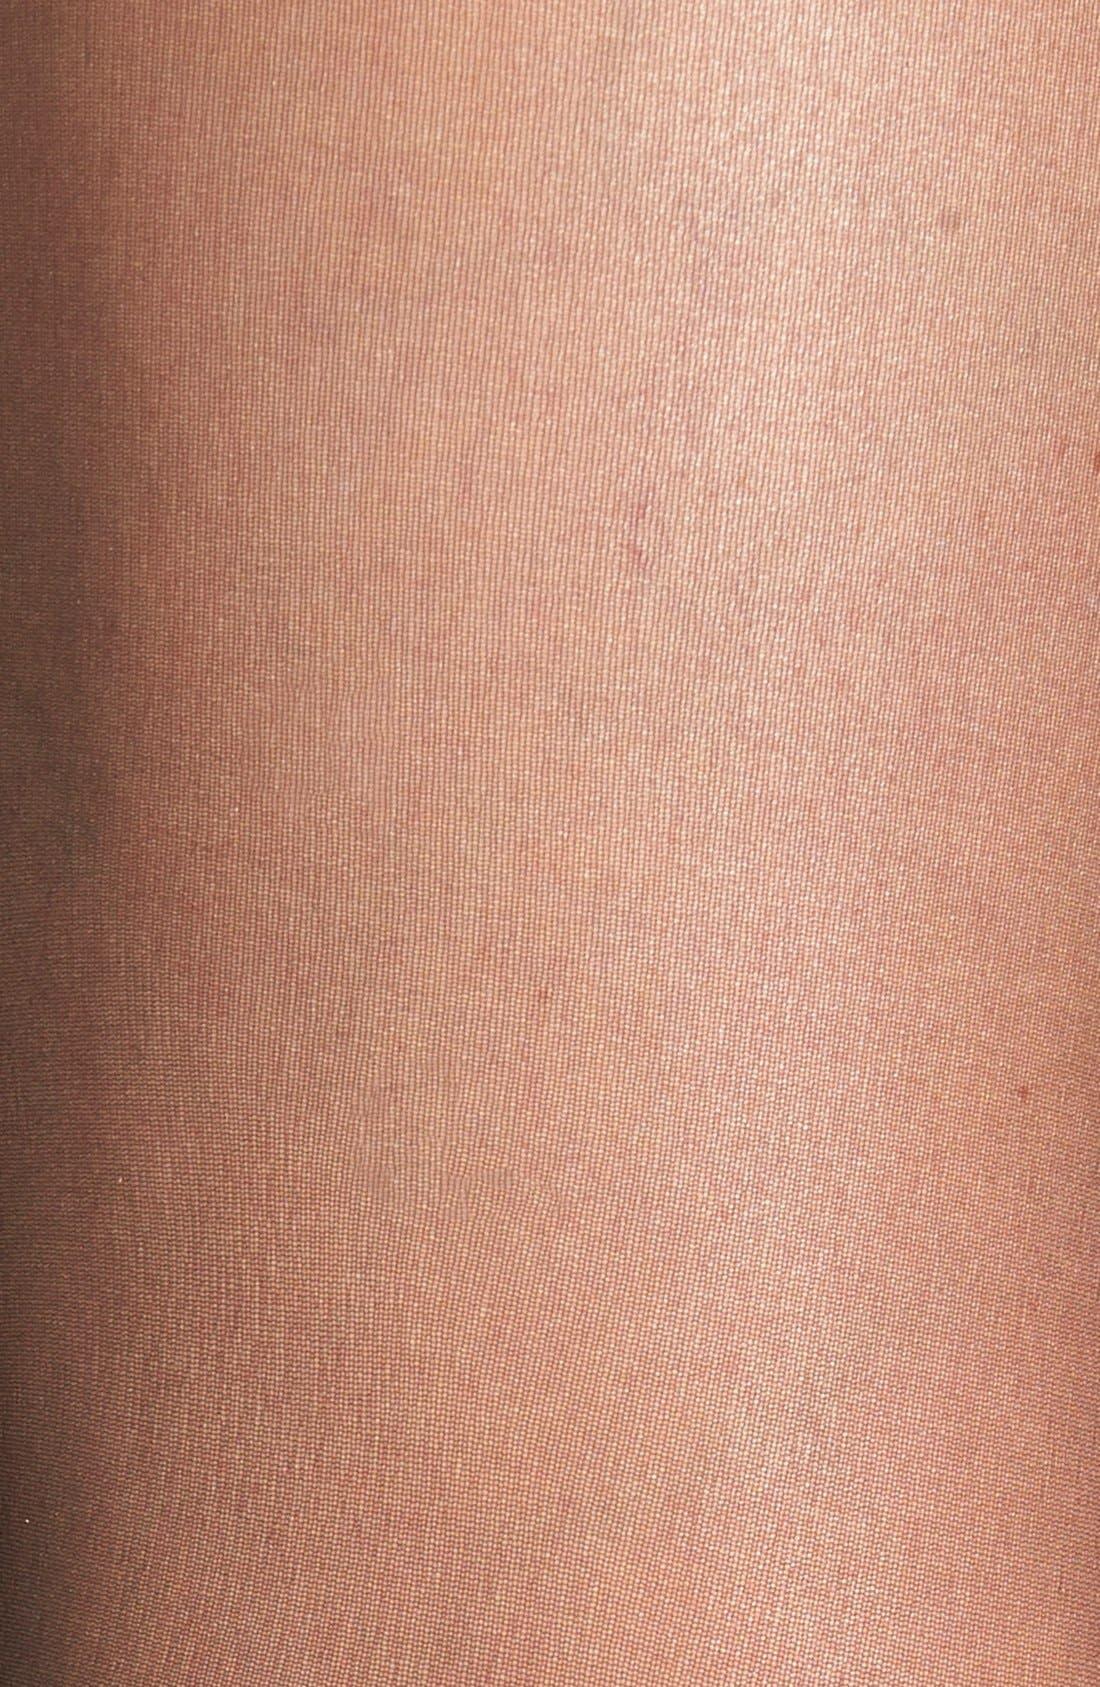 Alternate Image 2  - Commando Thigh High Sheer Stockings